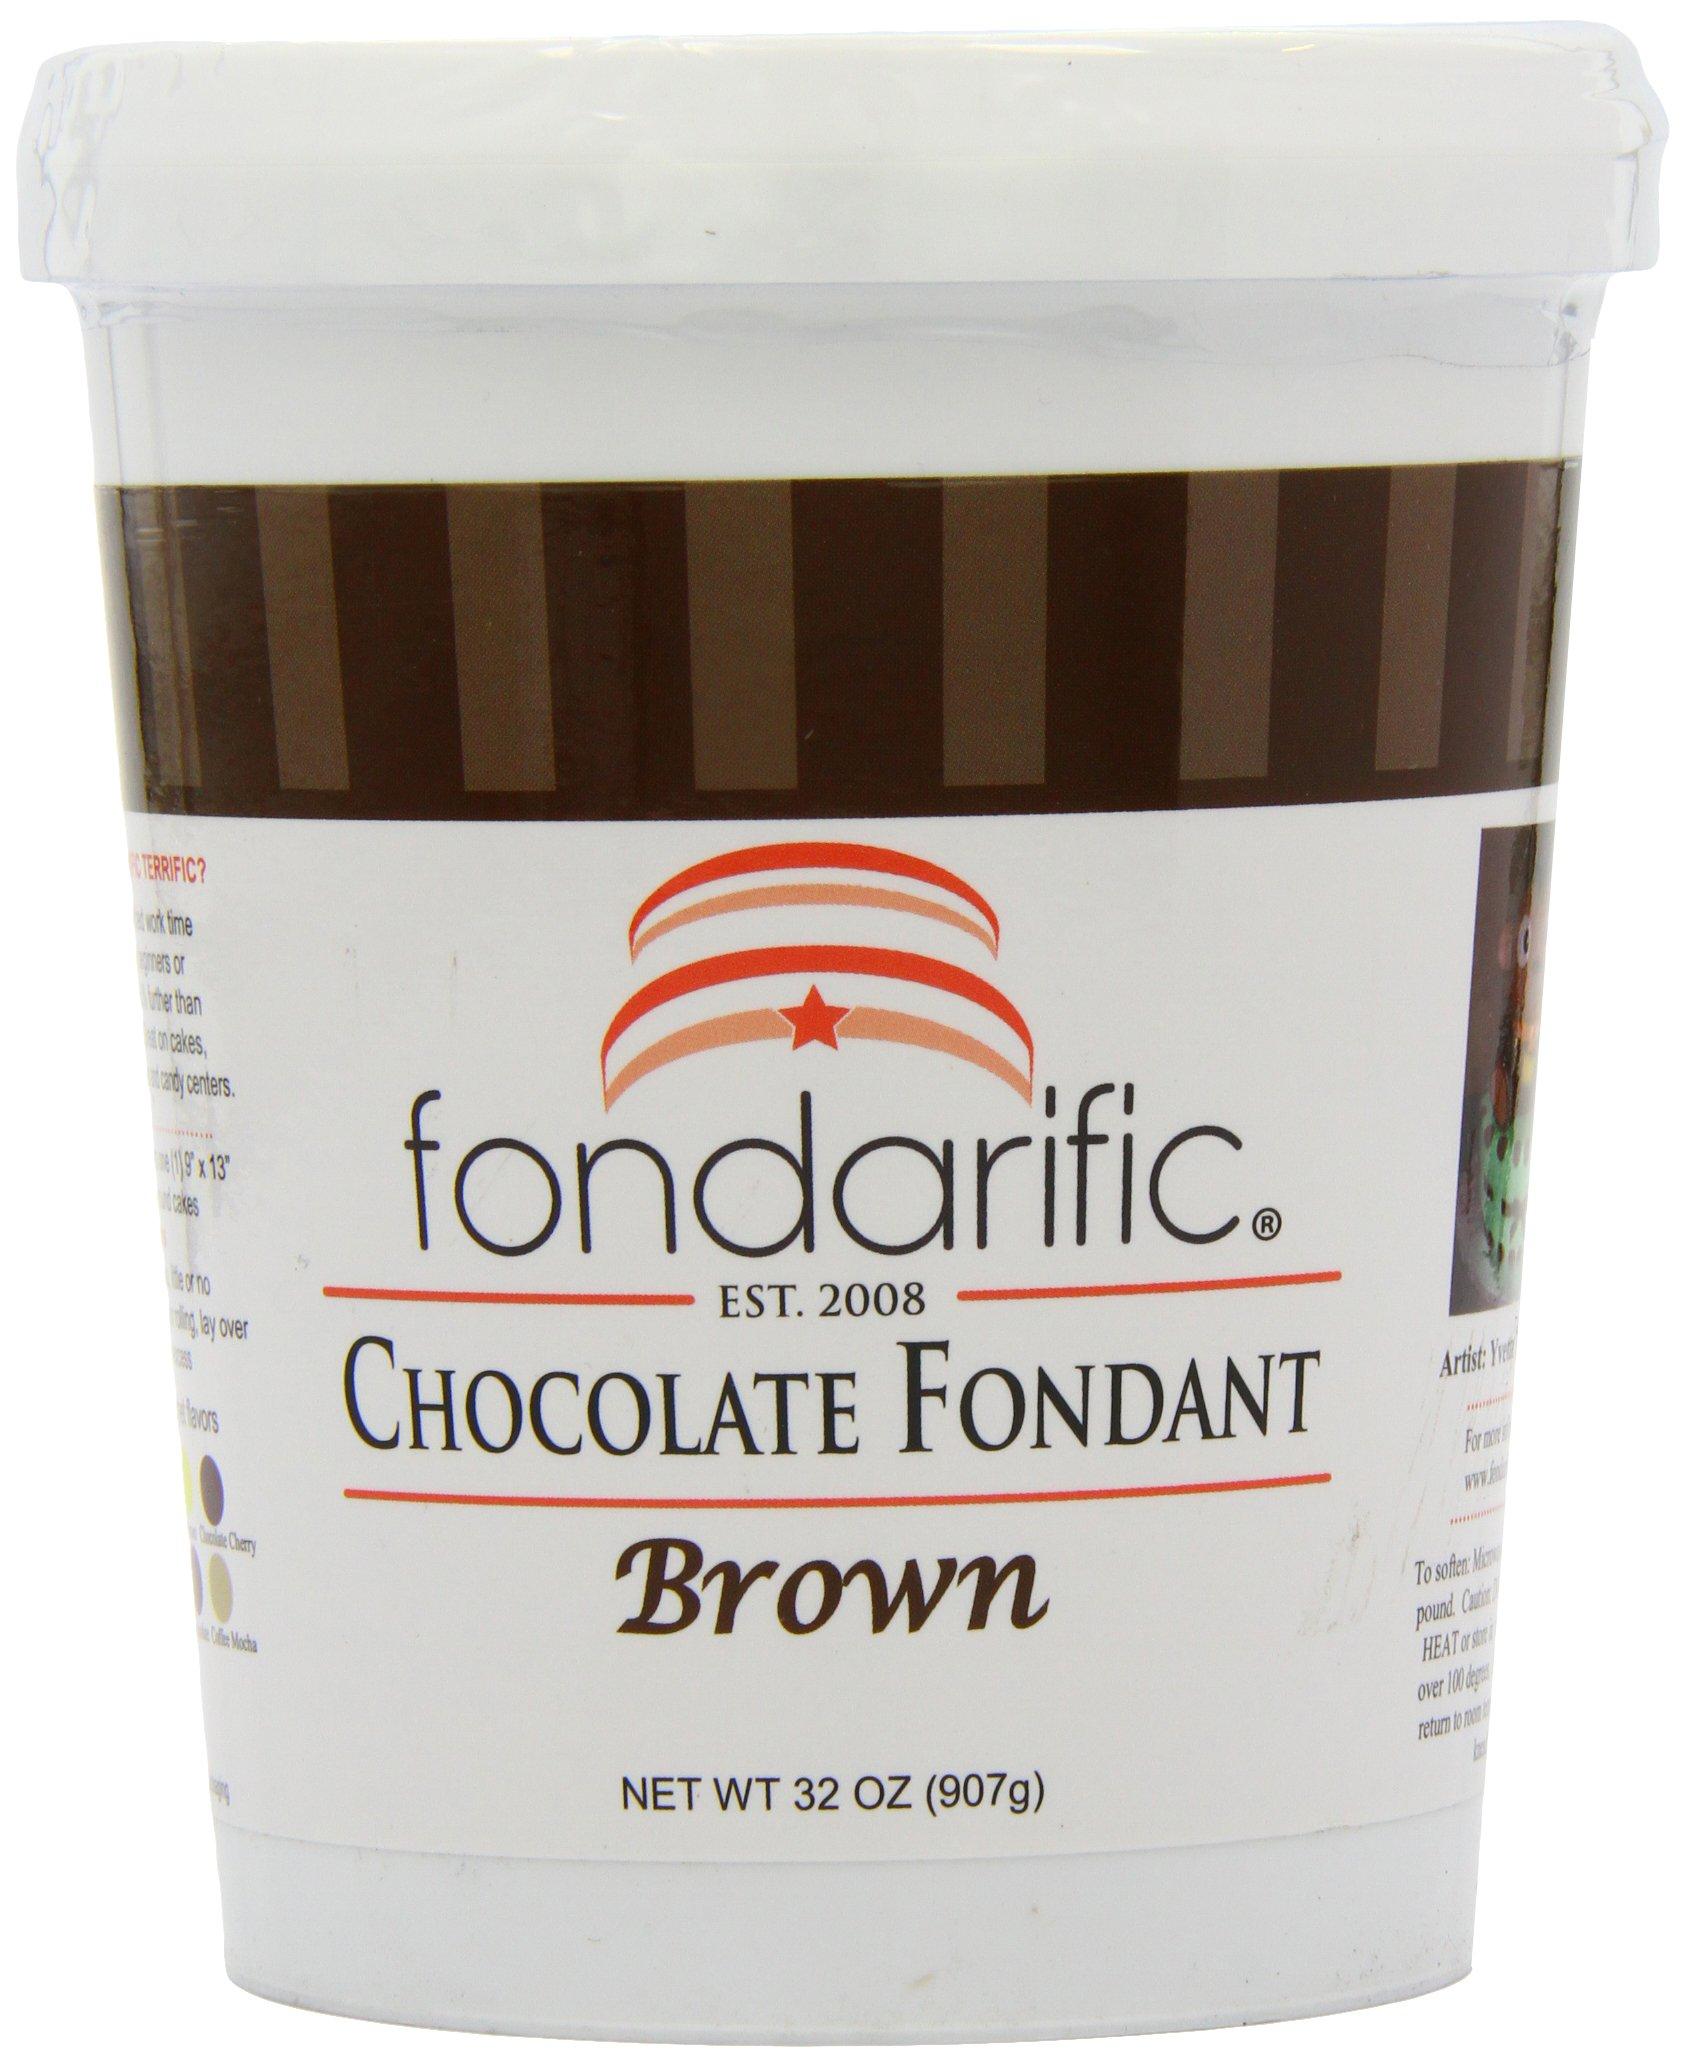 Fondarific Chocolate Fondant Brown, 2-Pounds